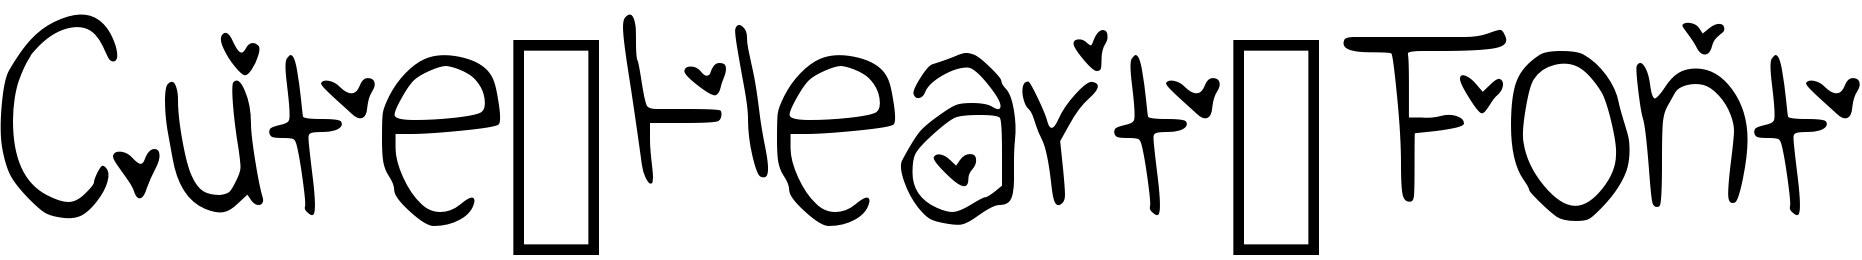 Cute_Heart_Font